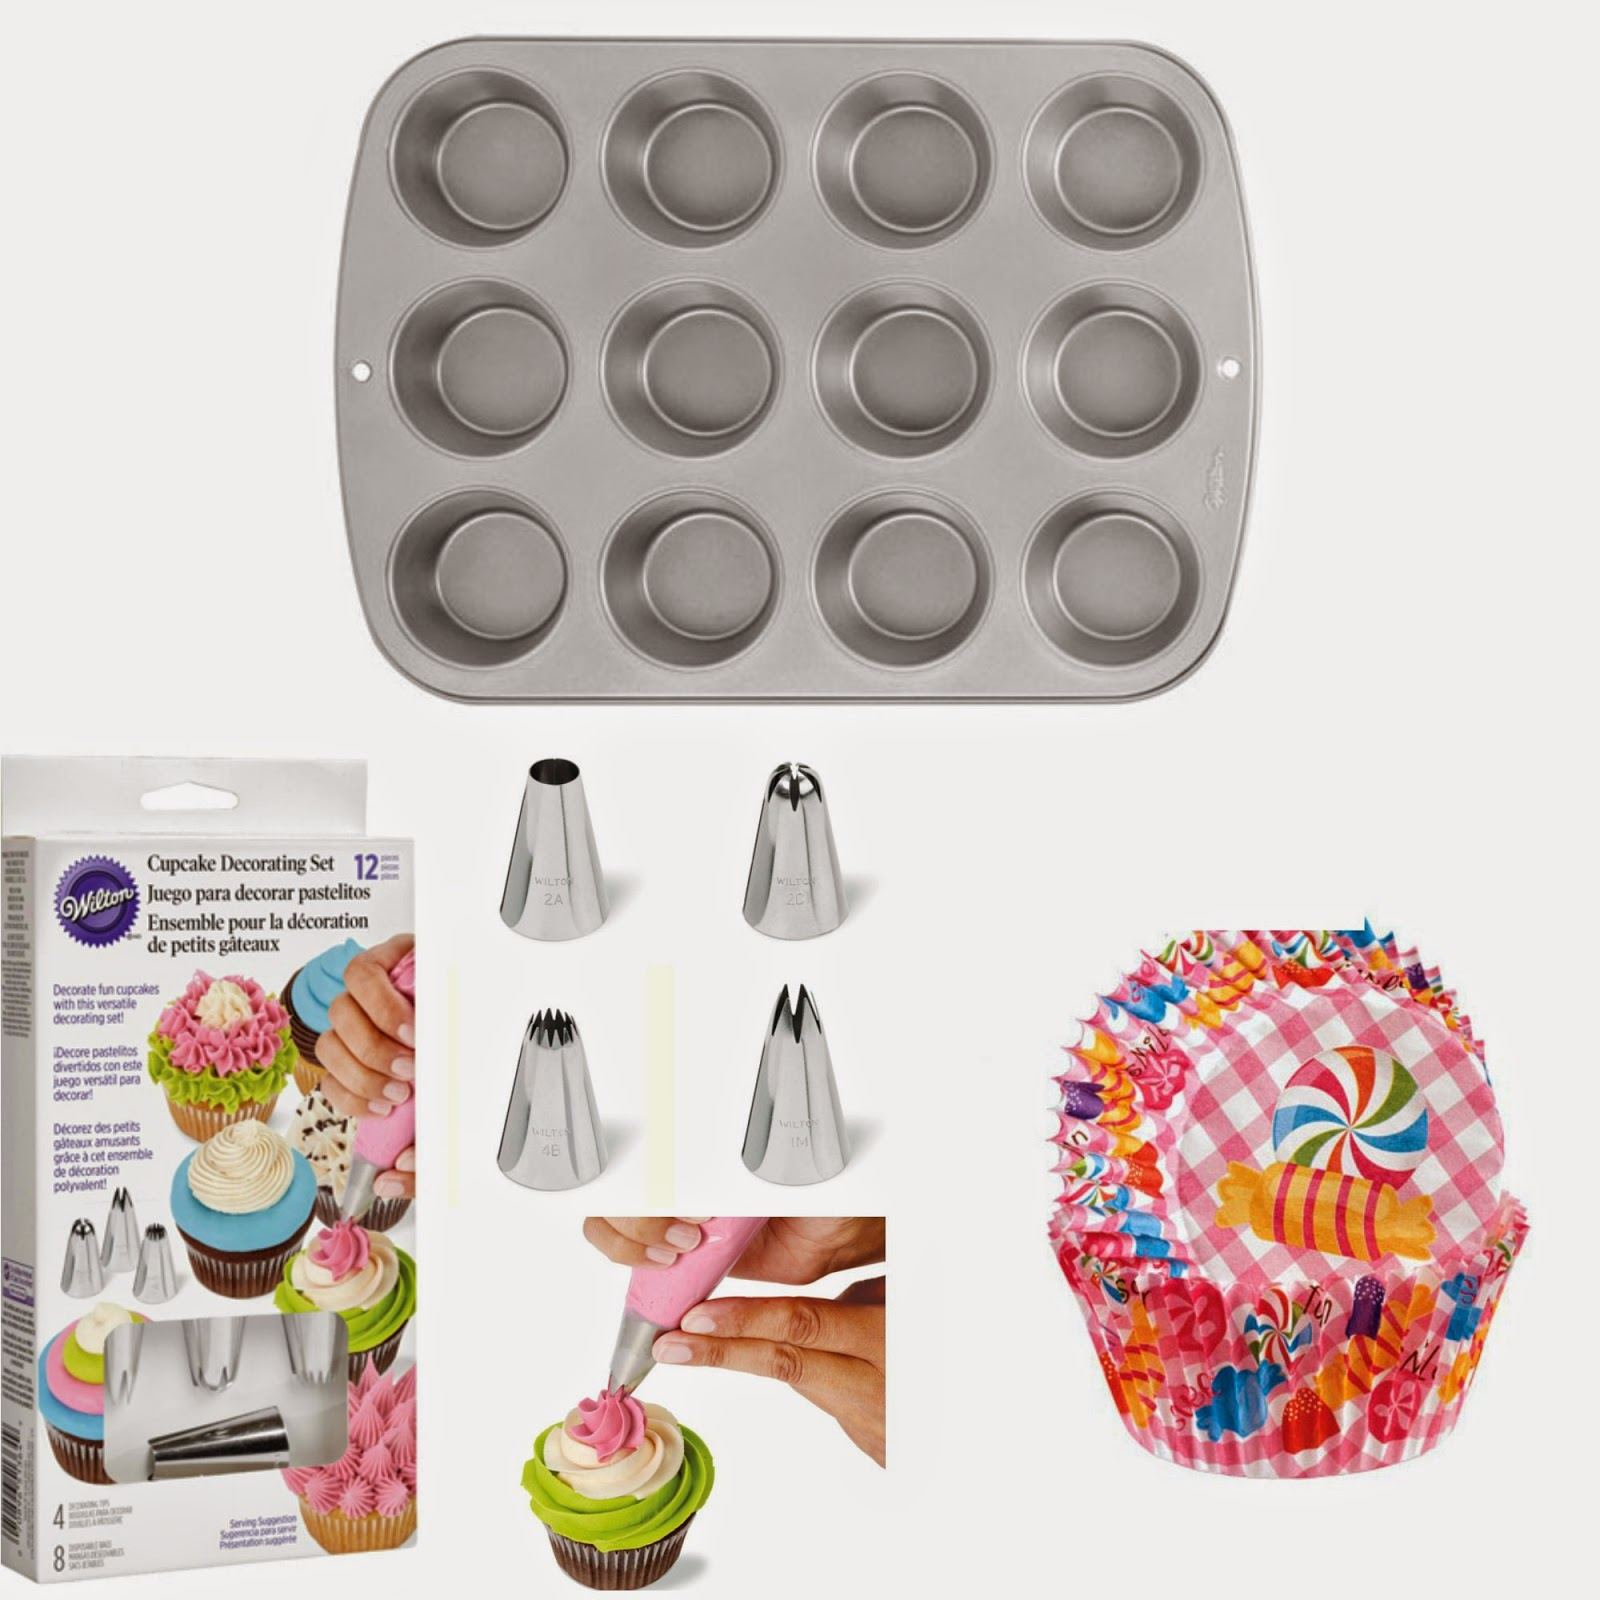 http://www.utensiliosdereposteria.com/kits-hada-de-algodon/1436-kit-de-supervivencia-cupcakes.html